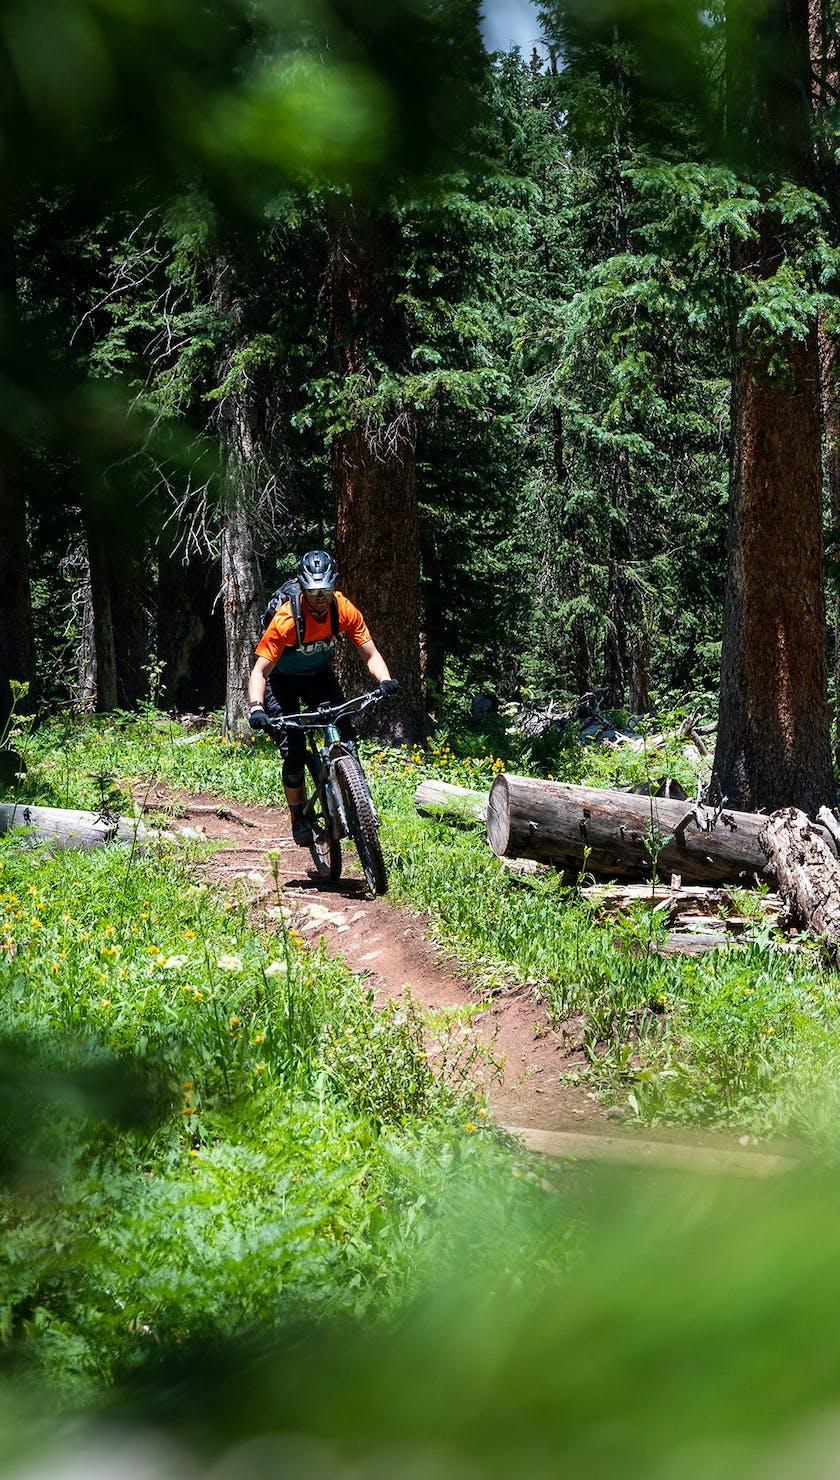 Durango Gathering 21 - Rewards